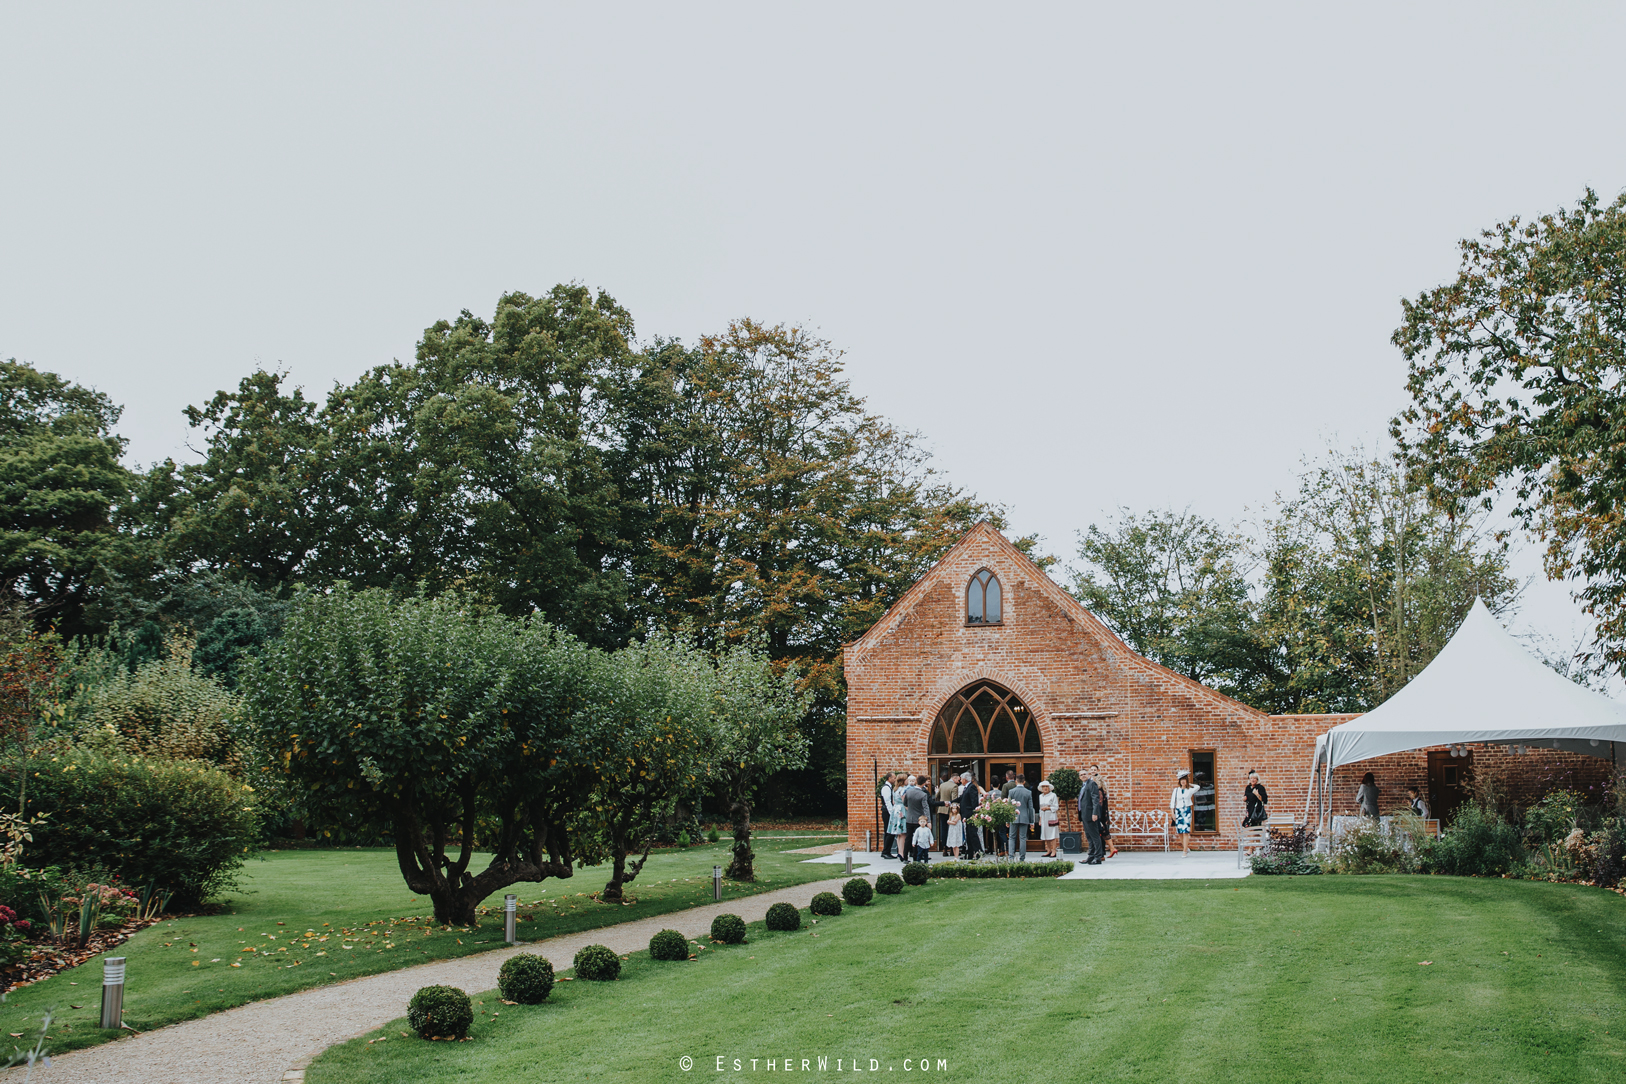 Reading_Room_Weddings_Alby_Norwich_Photographer_Esther_Wild_IMG_0673.jpg